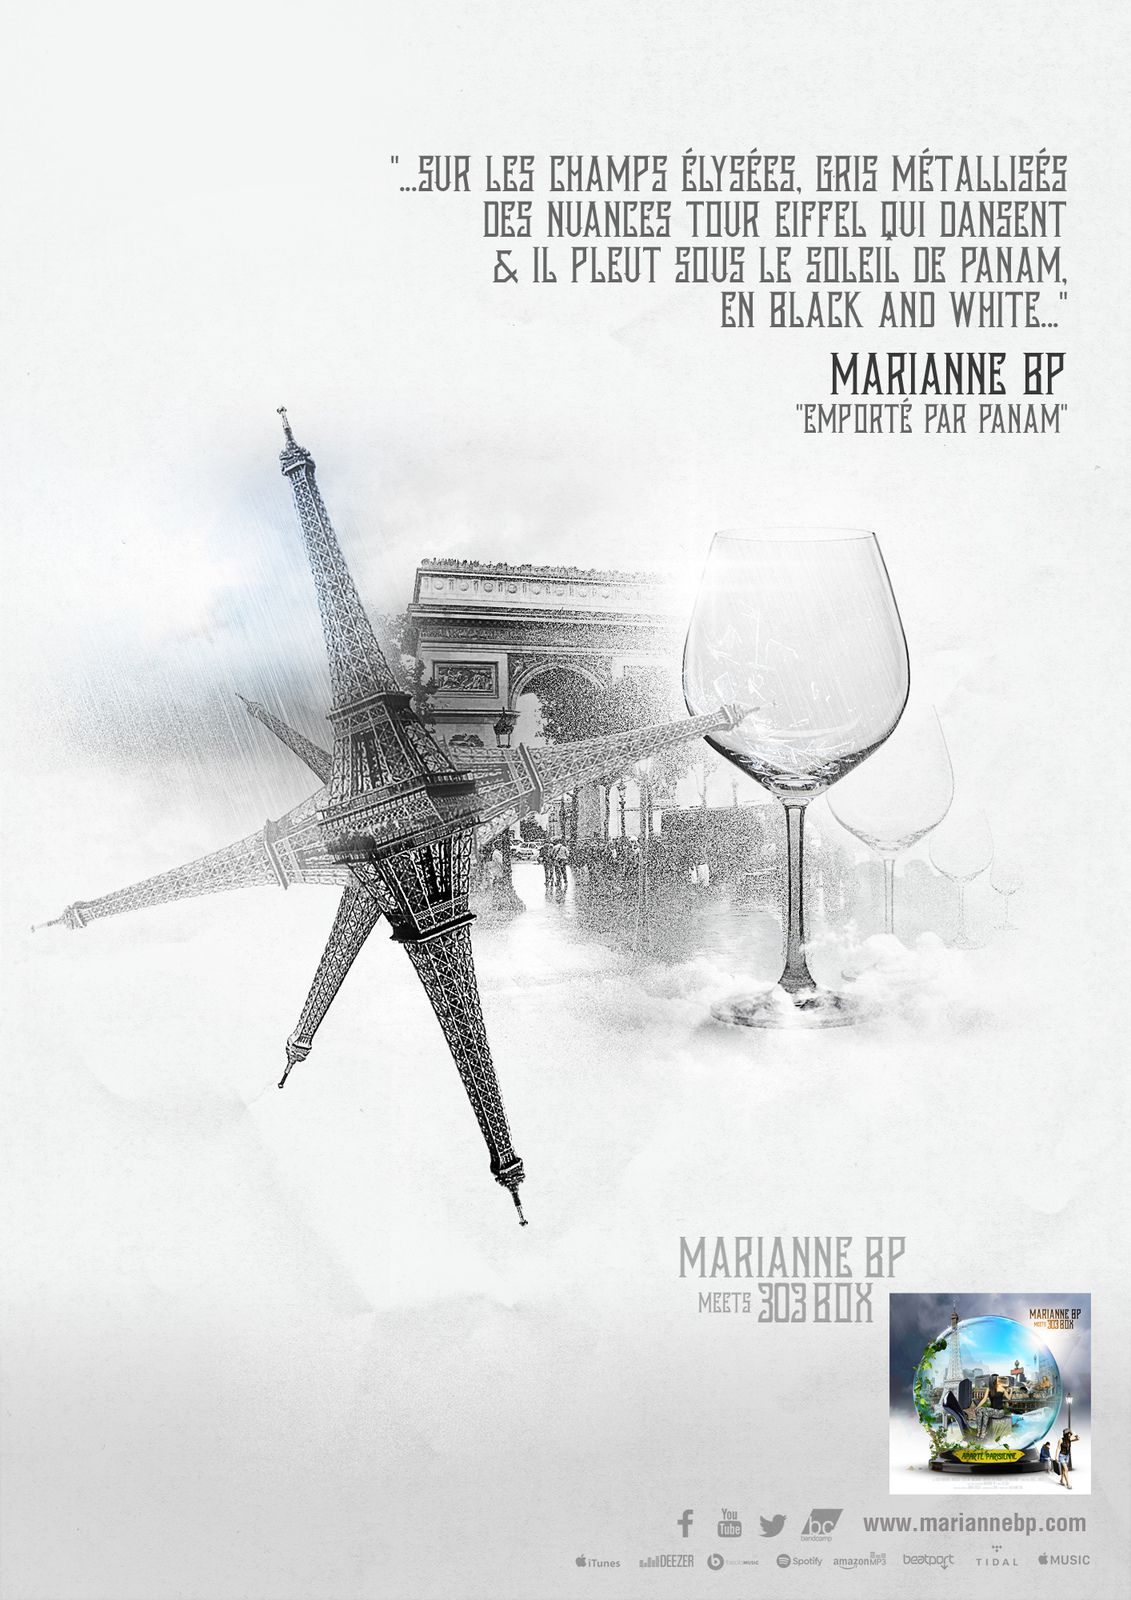 Marianne BP - aparté parisienne